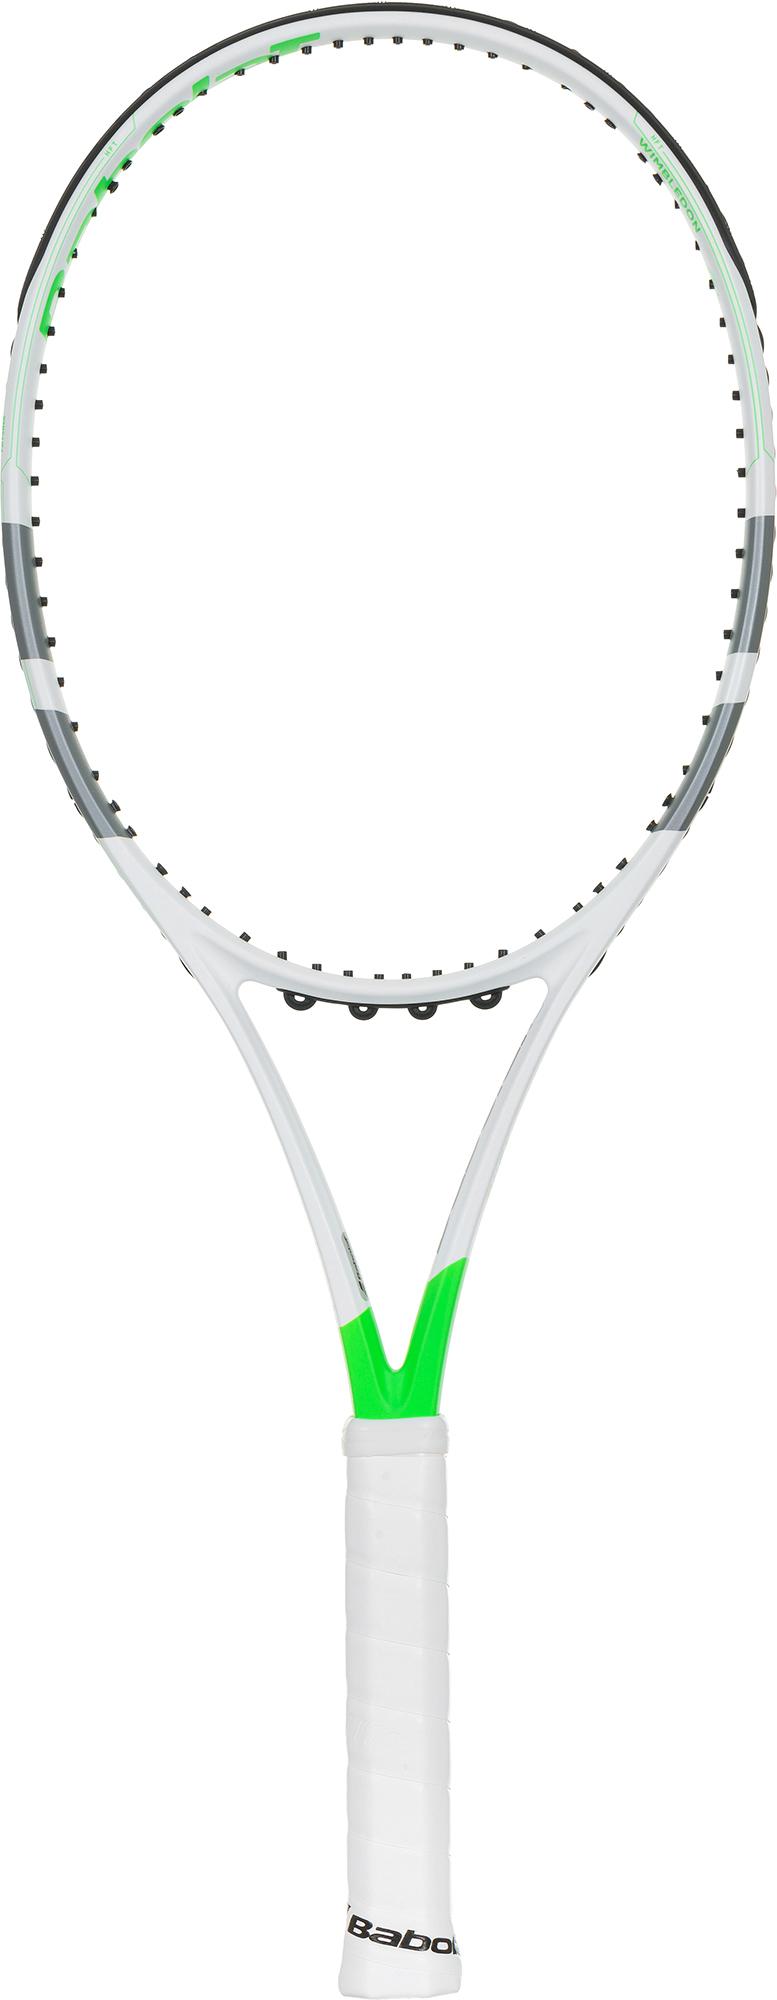 Babolat Ракетка для большого тенниса Babolat Pure Strike Lite 27', размер 3 погремушка lamaze